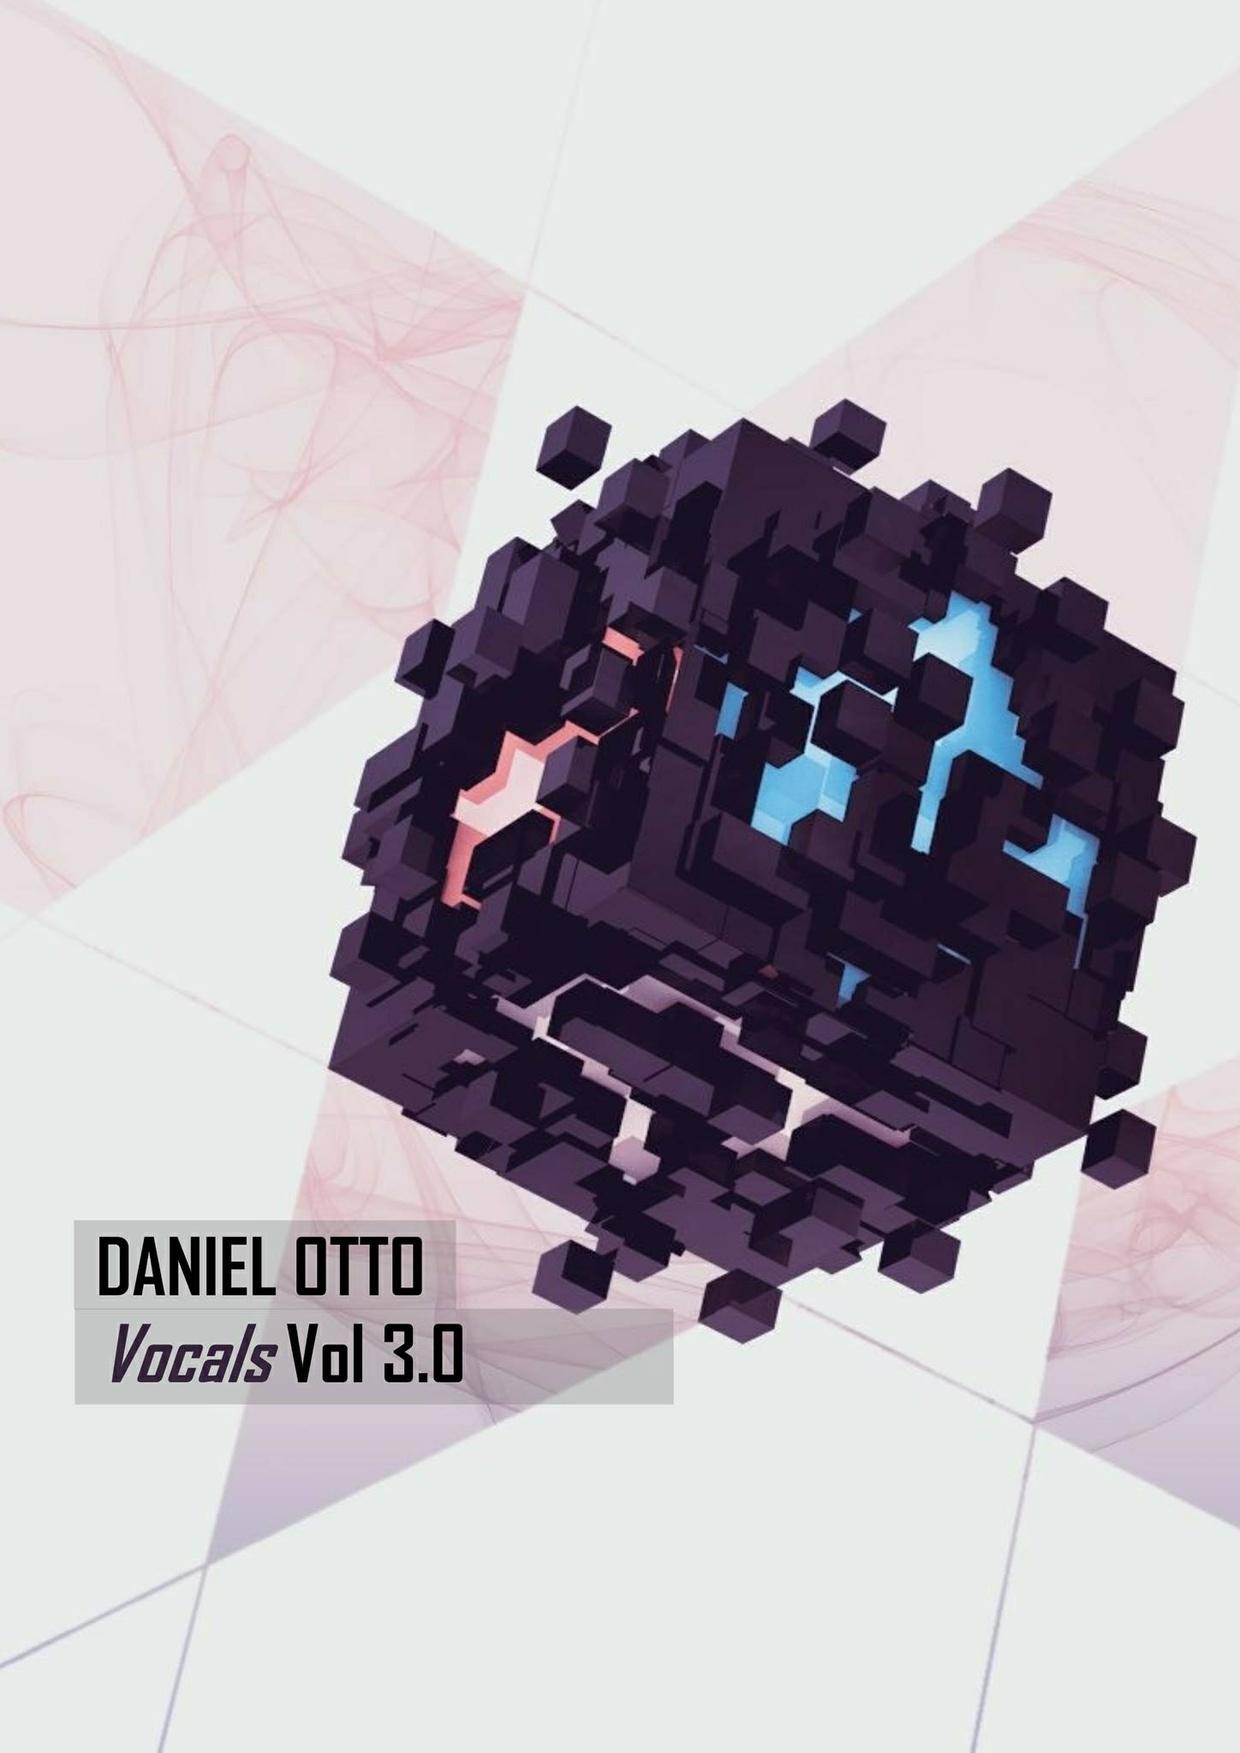 Otto's Vocal Samples Vol 3.0